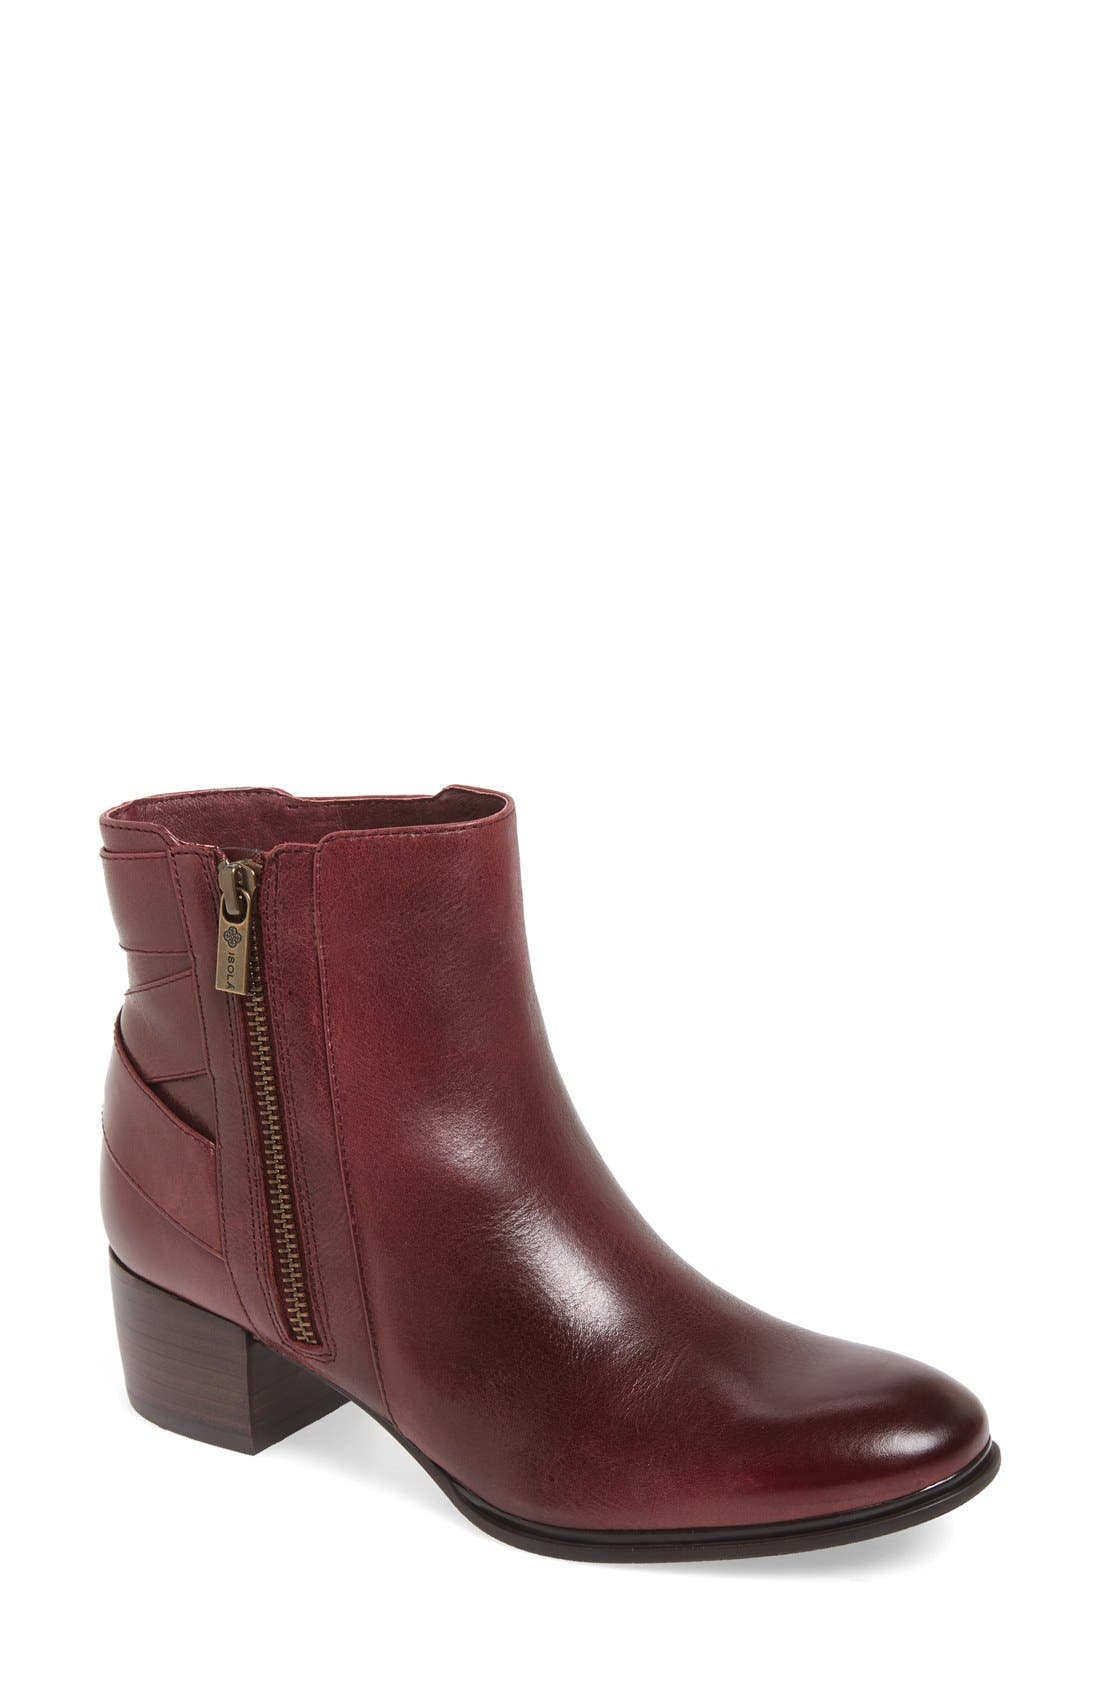 'Delta' Bootie,                         Main,                         color, Burgundy Leather